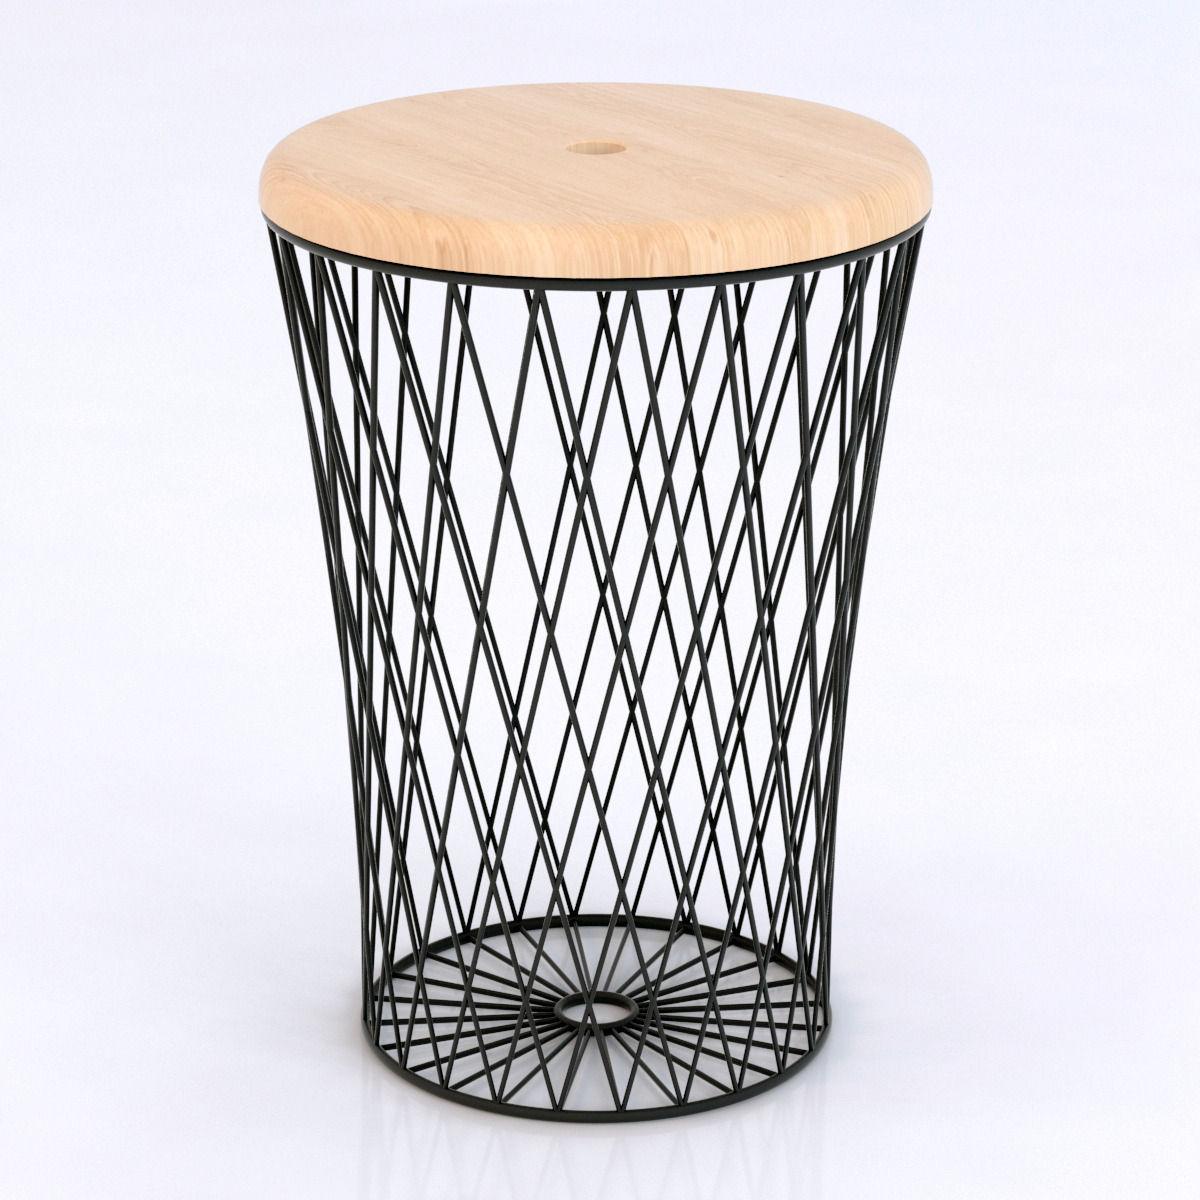 boconcept stool 3d model max obj 3ds fbx mtl. Black Bedroom Furniture Sets. Home Design Ideas